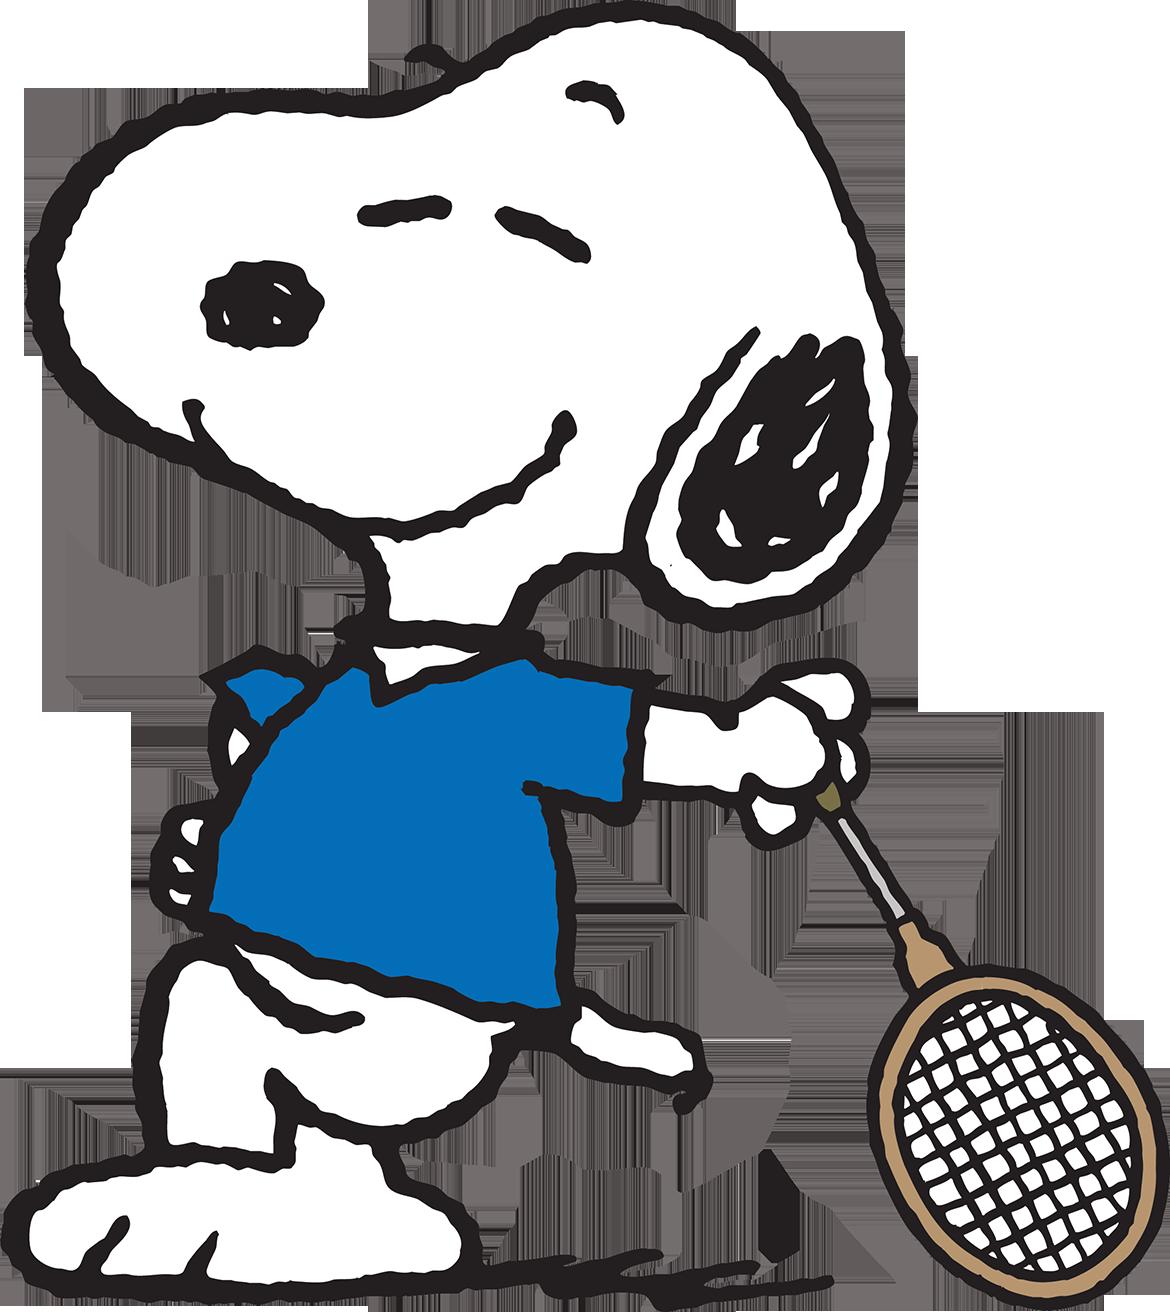 Charlie brown baseball clipart clipart transparent Snoopy Charlie Brown MetLife Punjab National Bank Baseball - snoopy ... clipart transparent